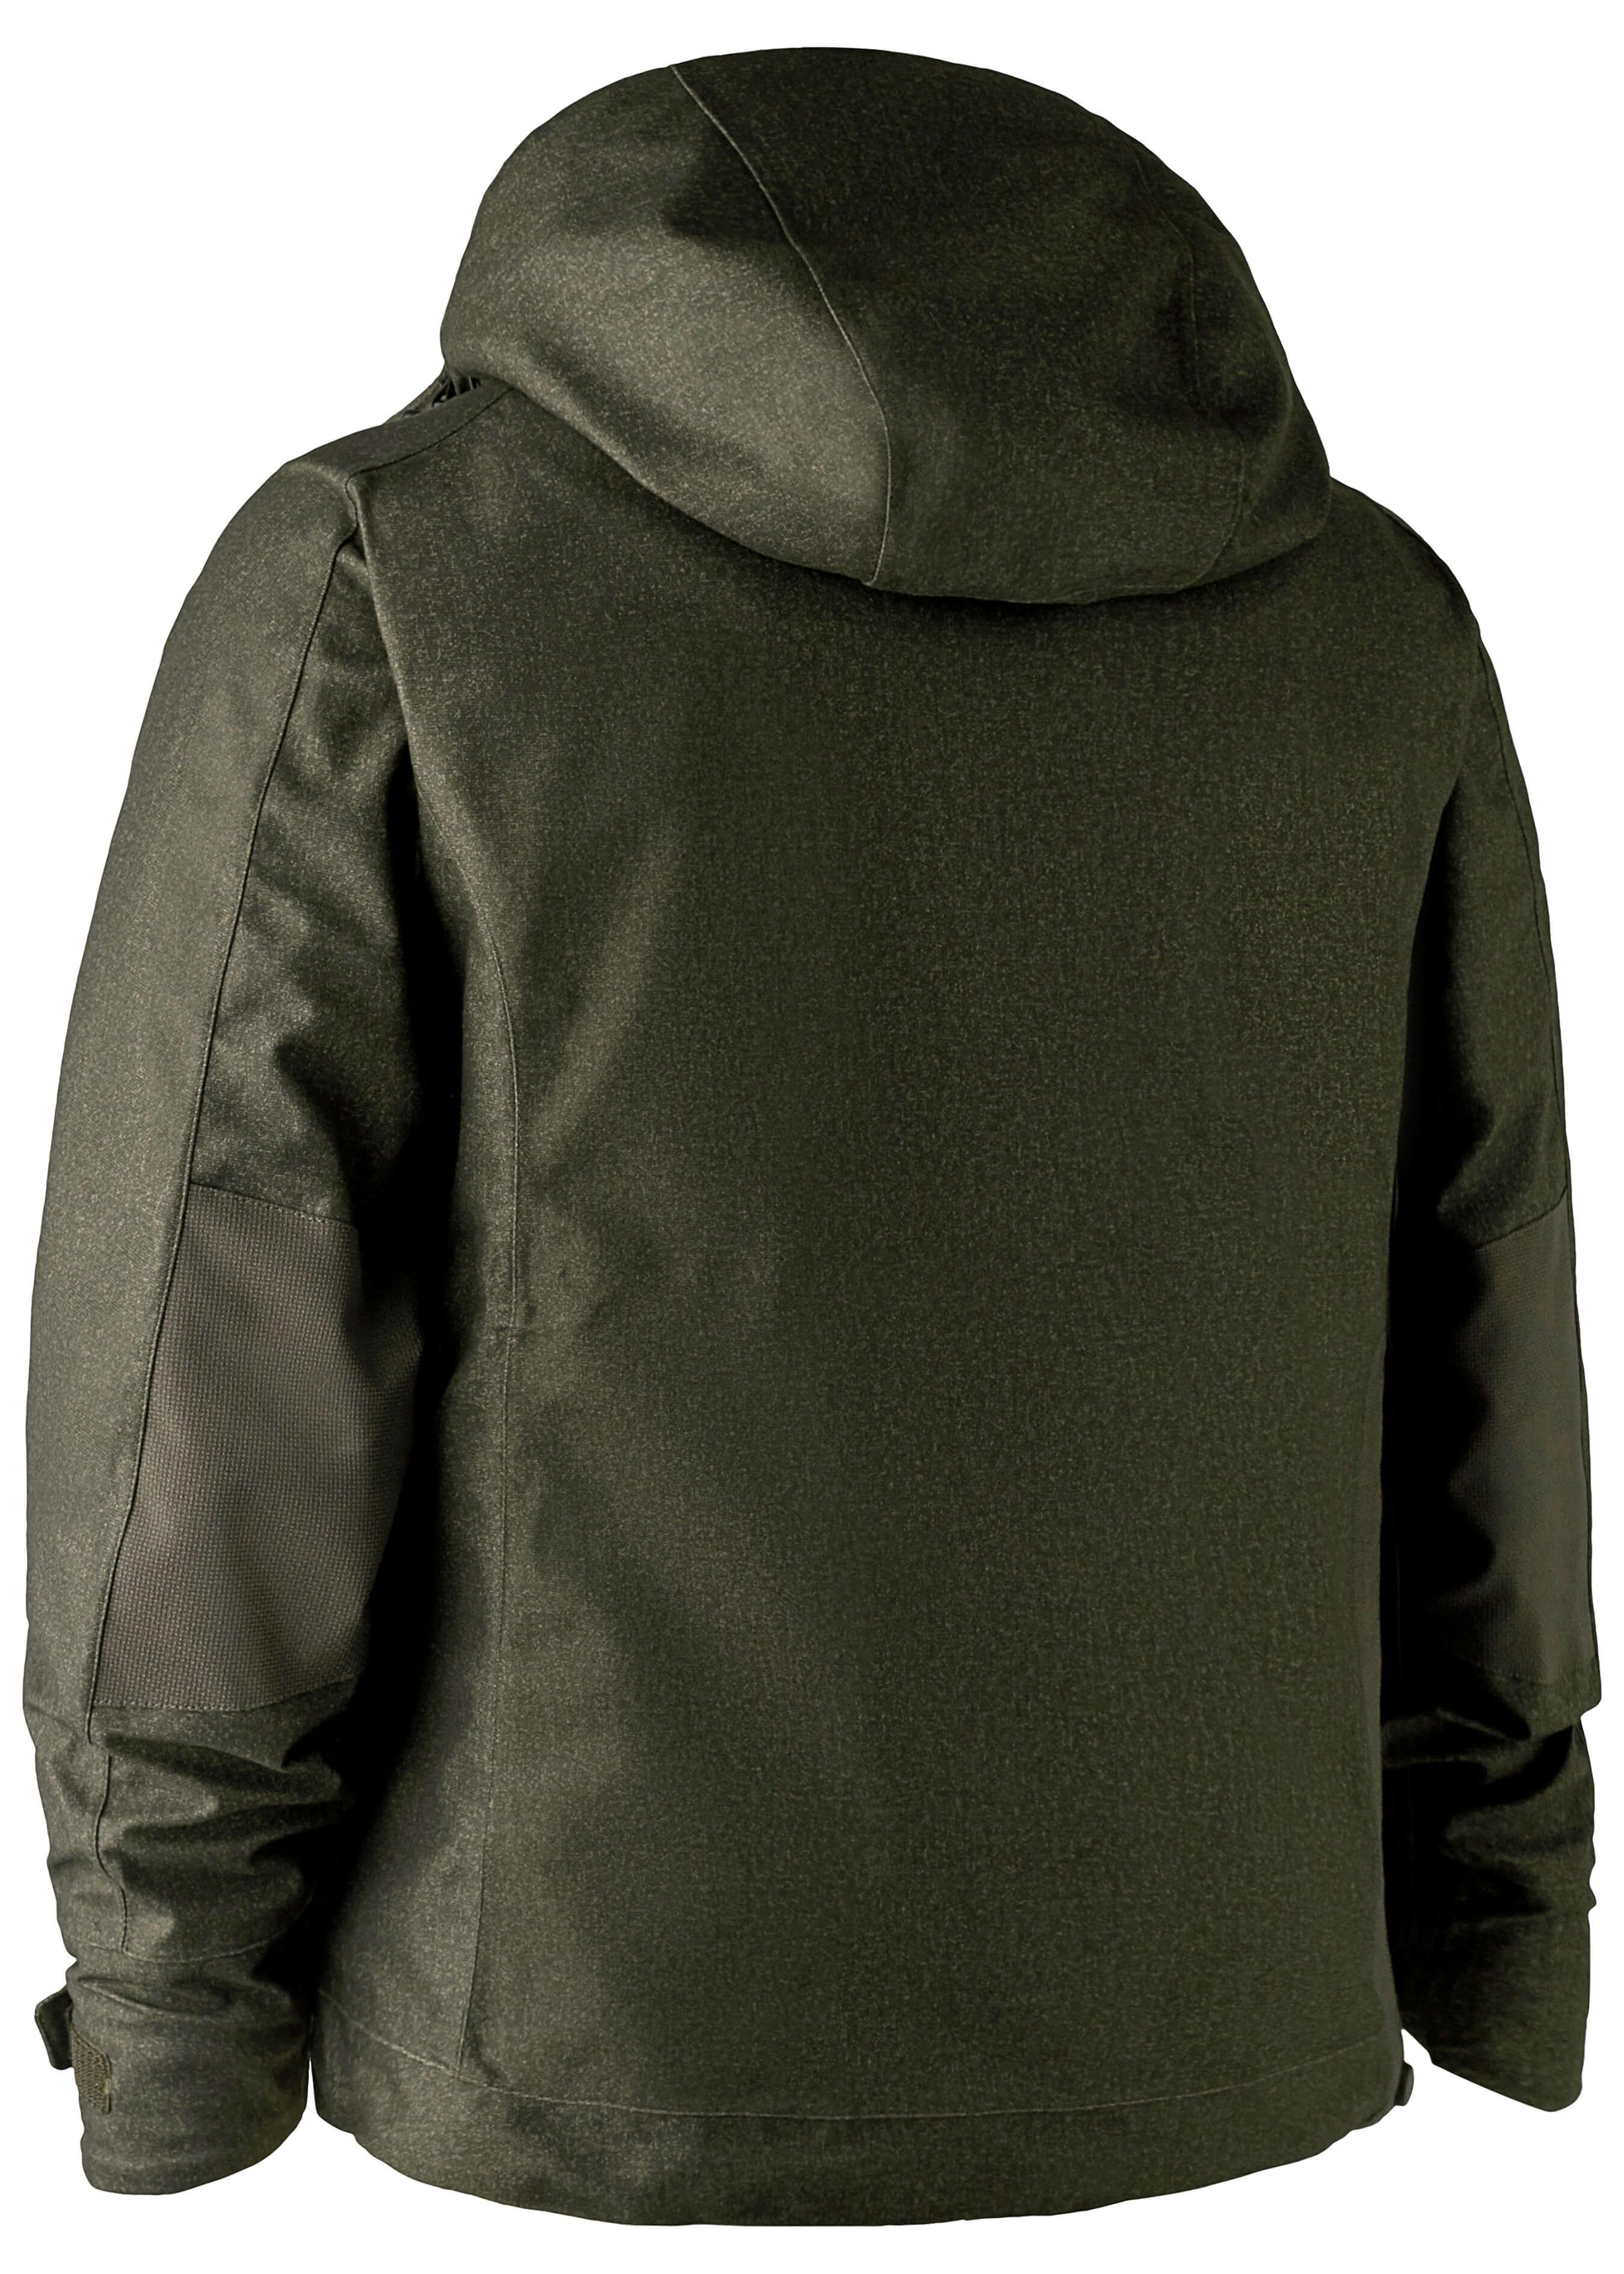 veste de chasse Ram 26442448 2